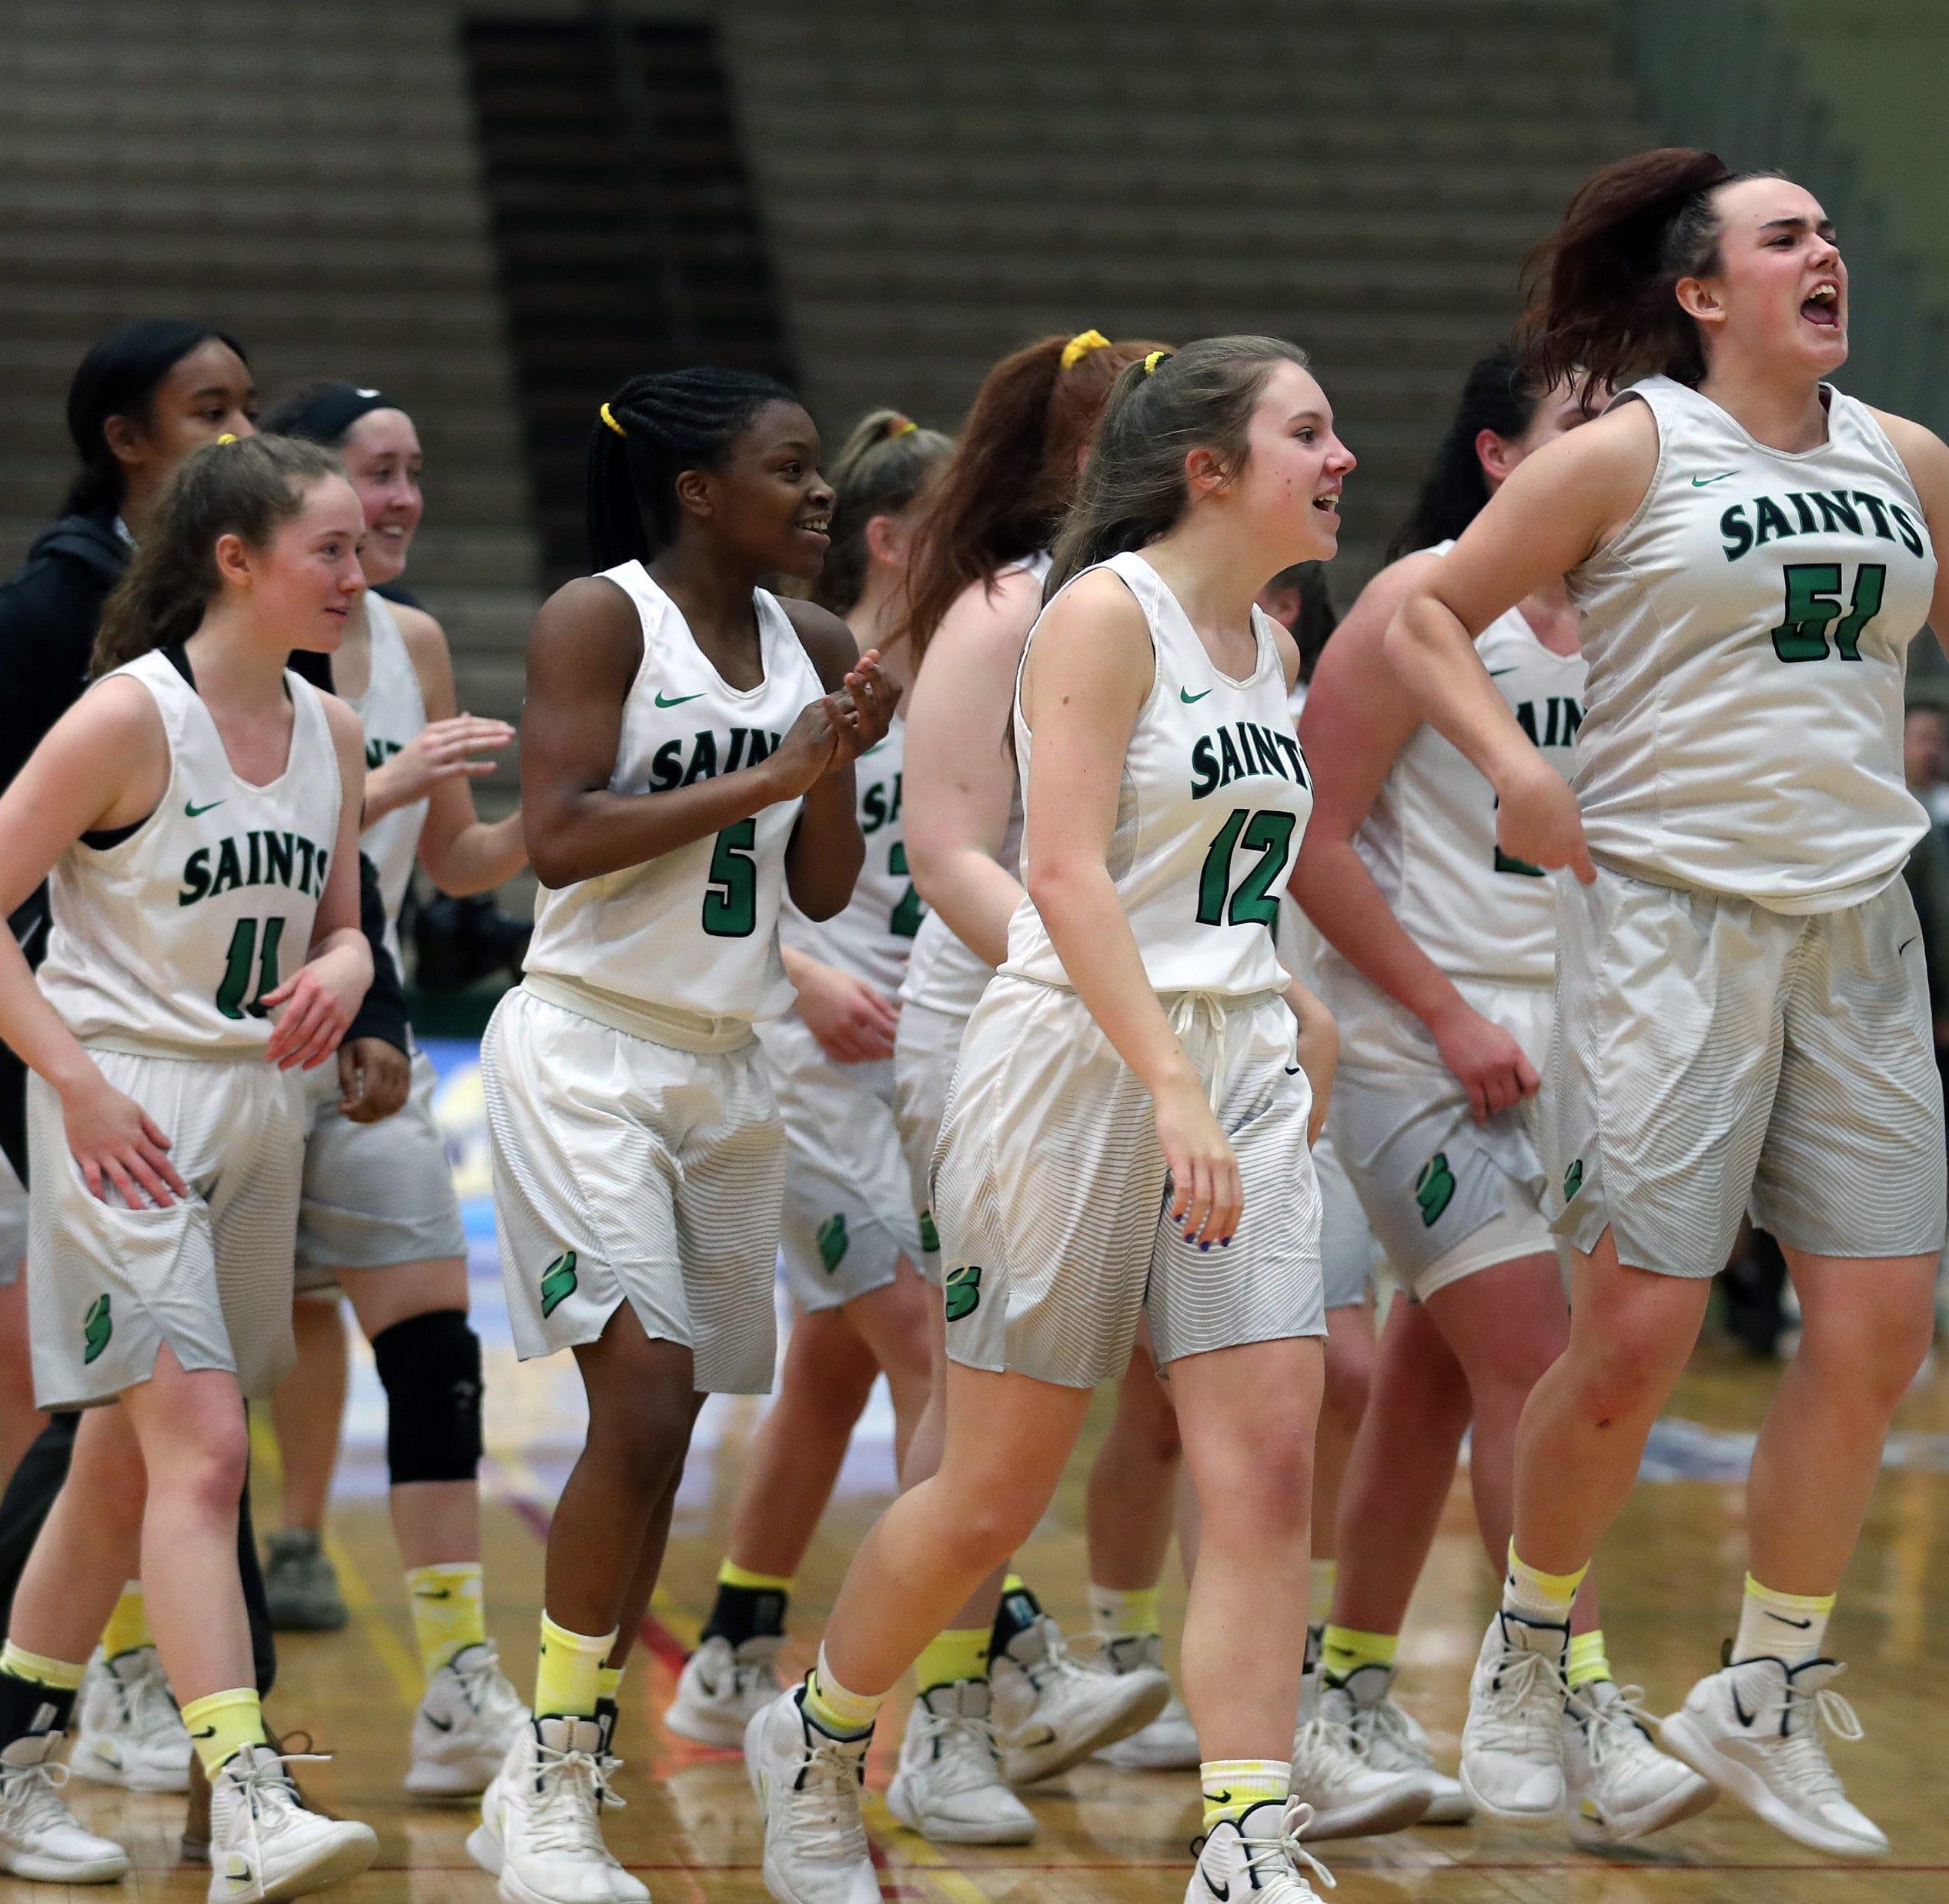 Girls Basketball: Seton Catholic Central advances to Class A state final